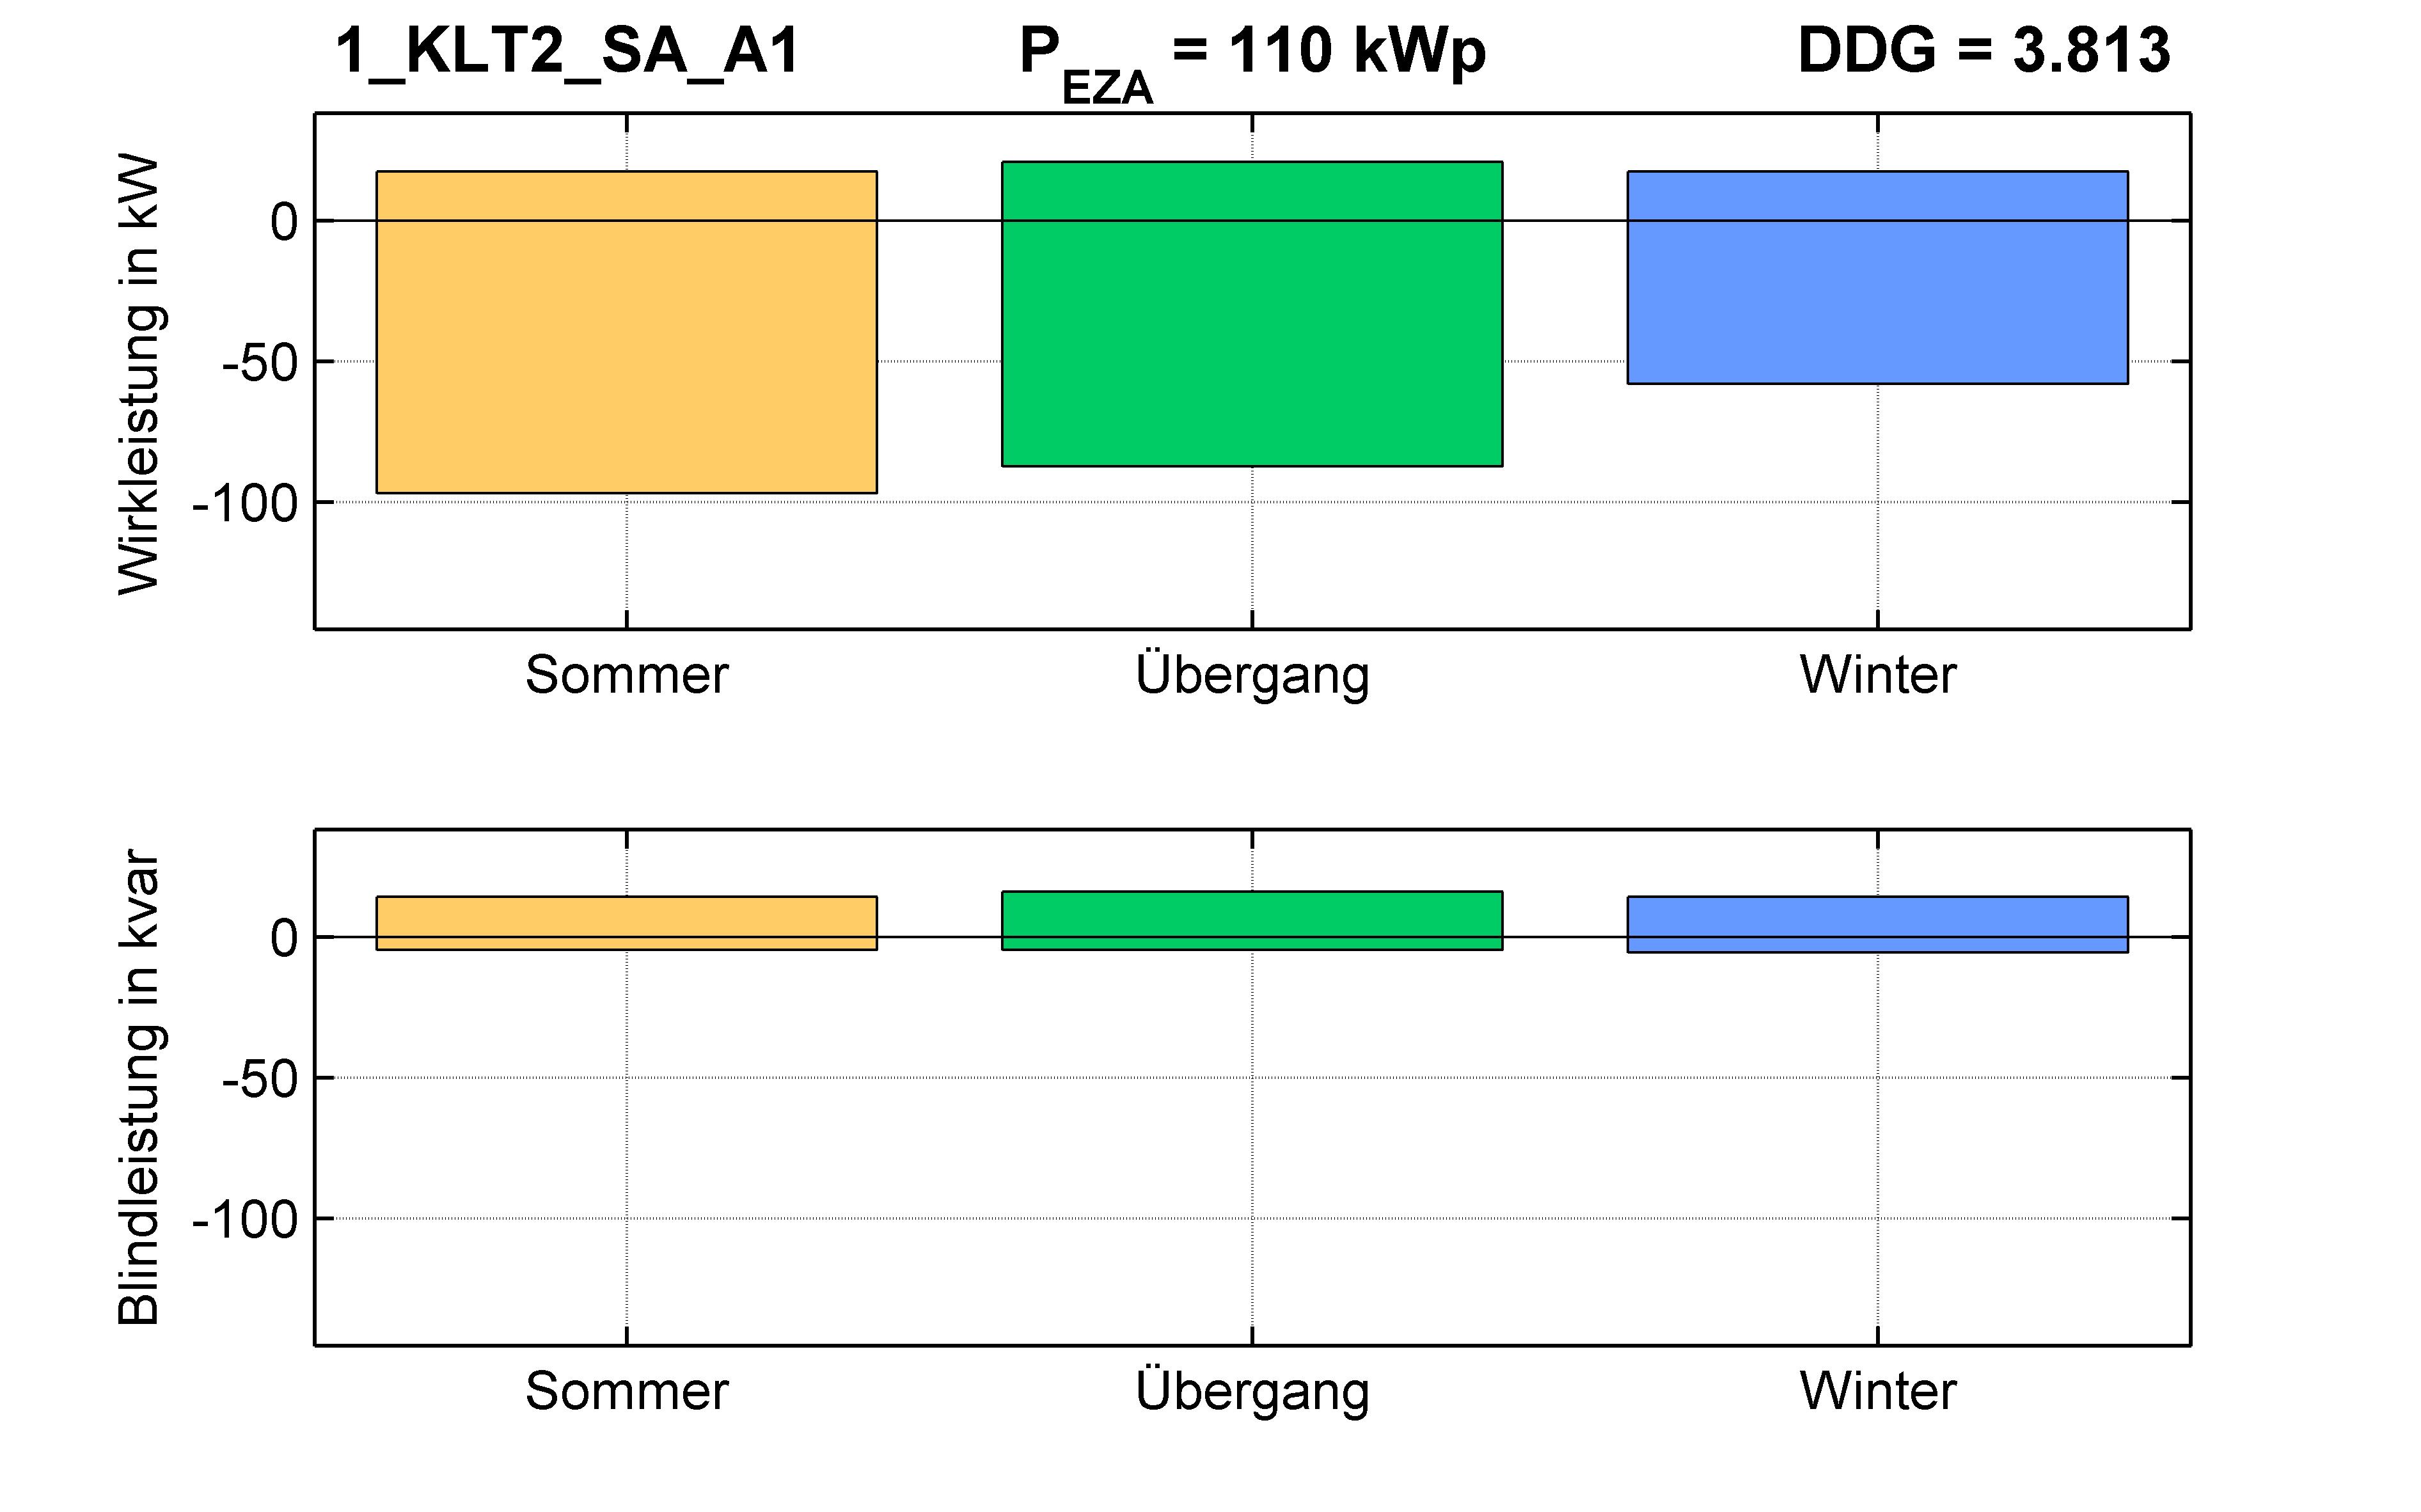 KLT2 | KABEL (SA) A1 | PQ-Bilanz